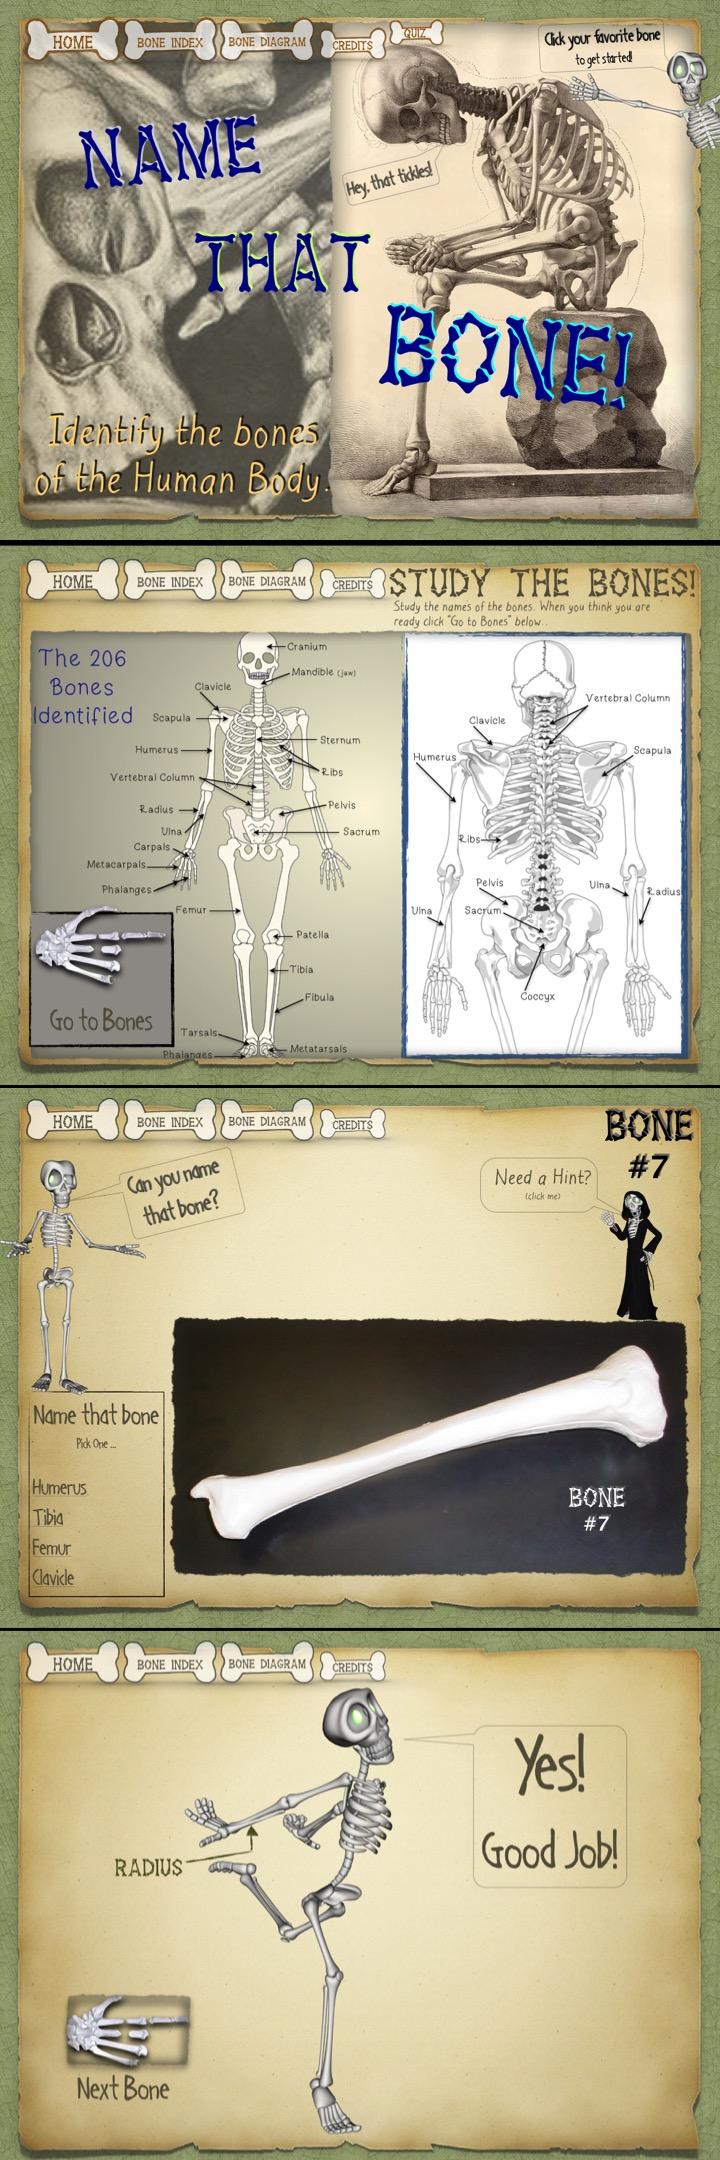 Build-A-Body: Skeletal System - GameUp - BrainPOP.